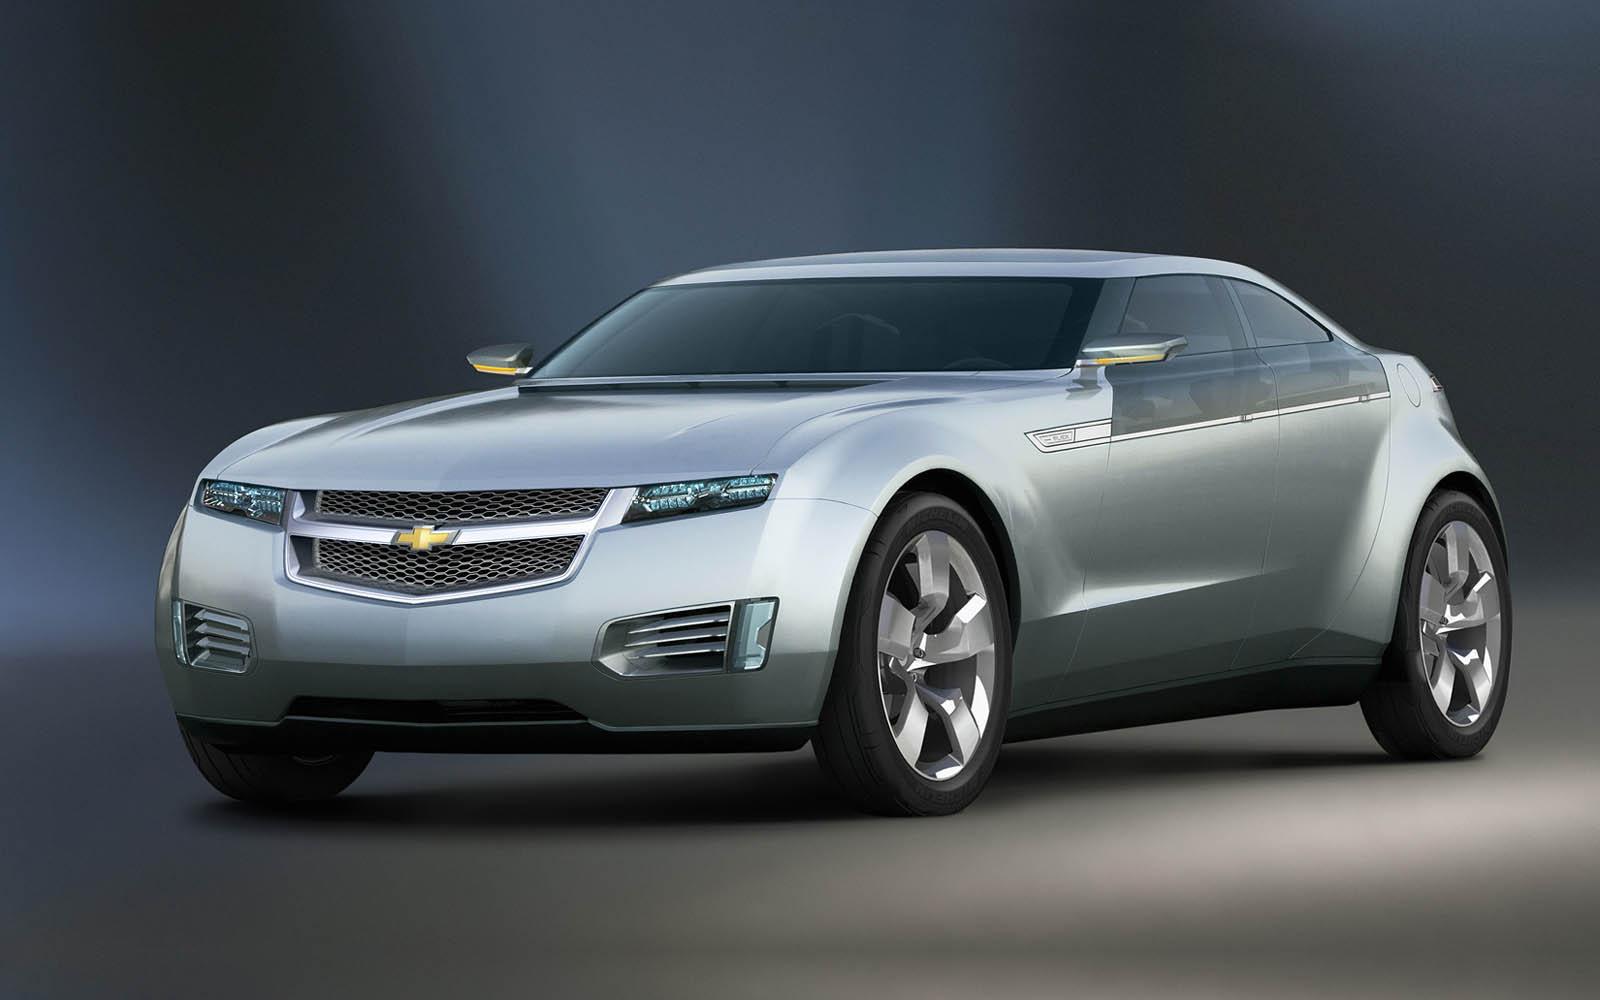 wallpapers: Chevrolet Volt Concept Car Photos